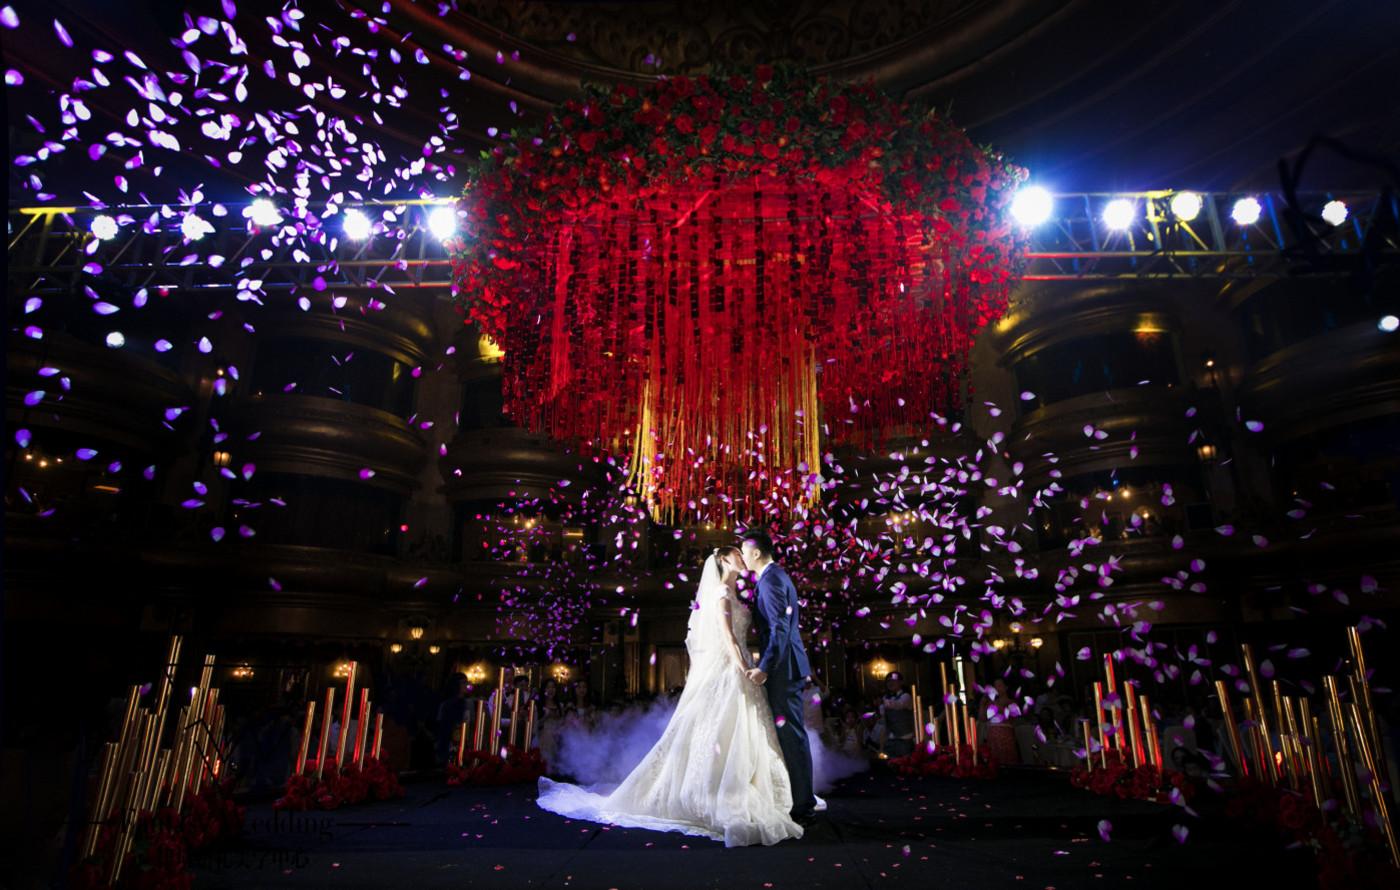 「Fantasy Wedding」& 等你下课5